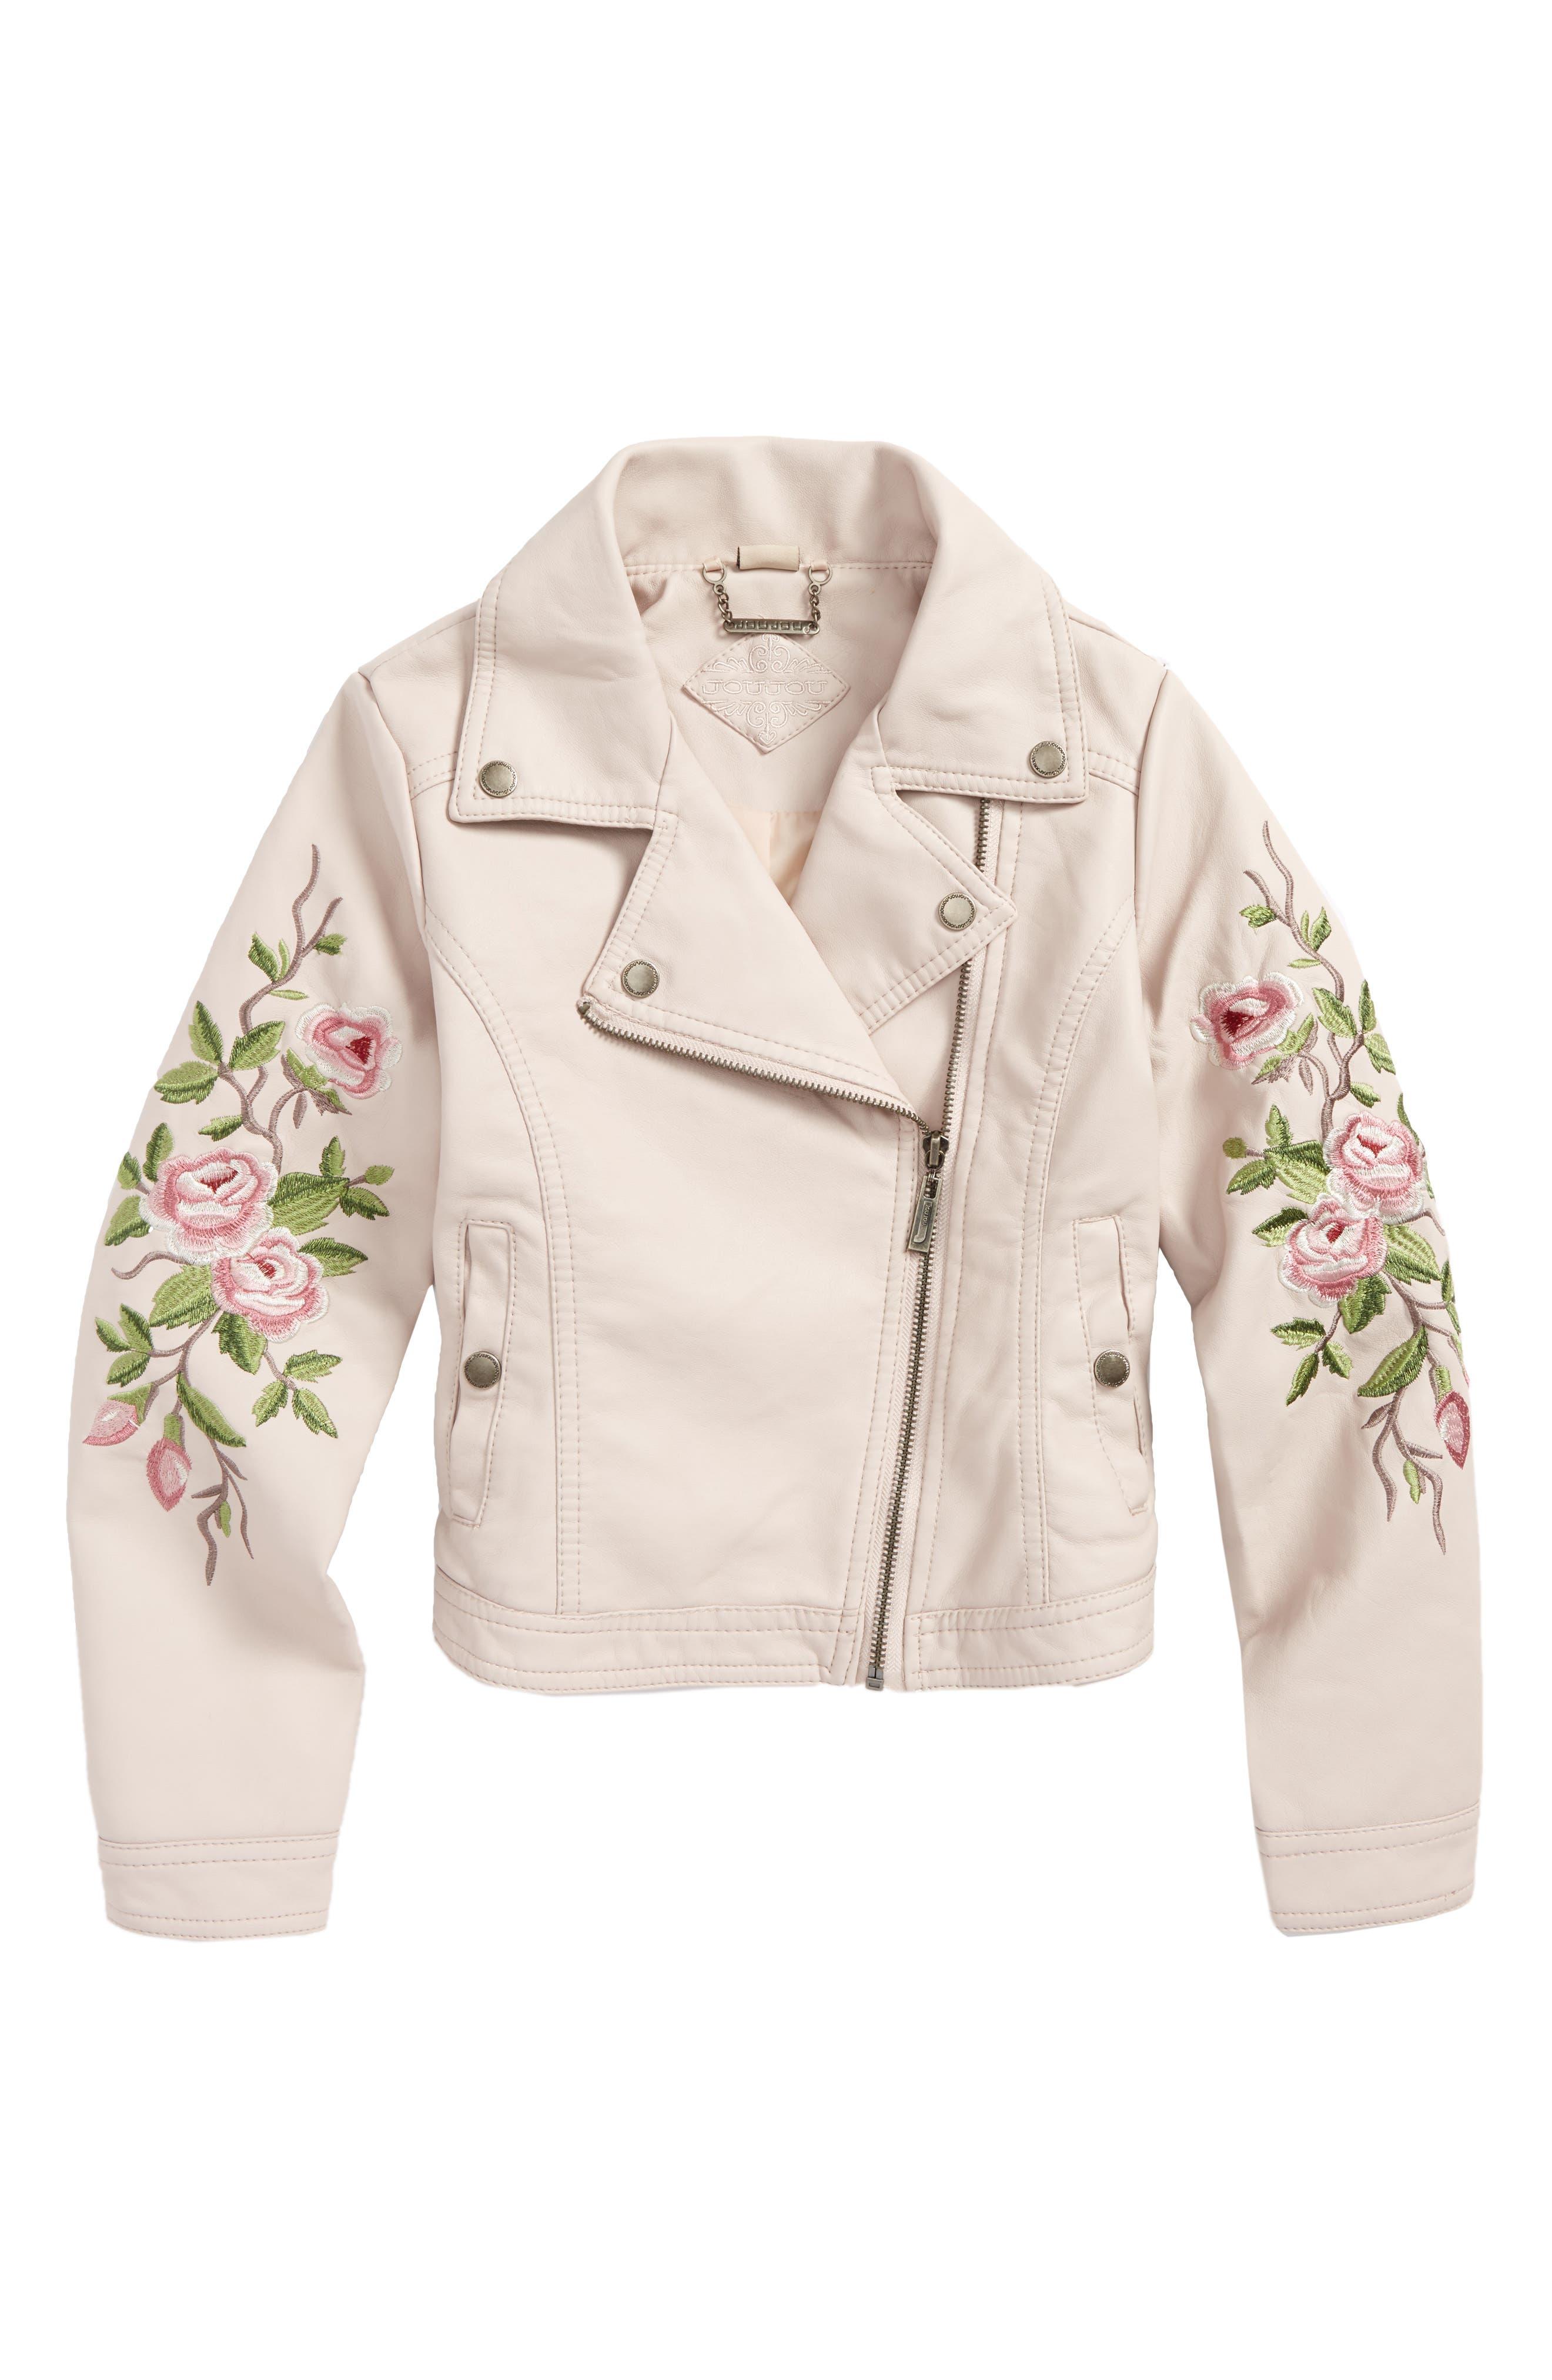 Jou Jou Embroidered Faux Leather Moto Jacket (Big Girls)